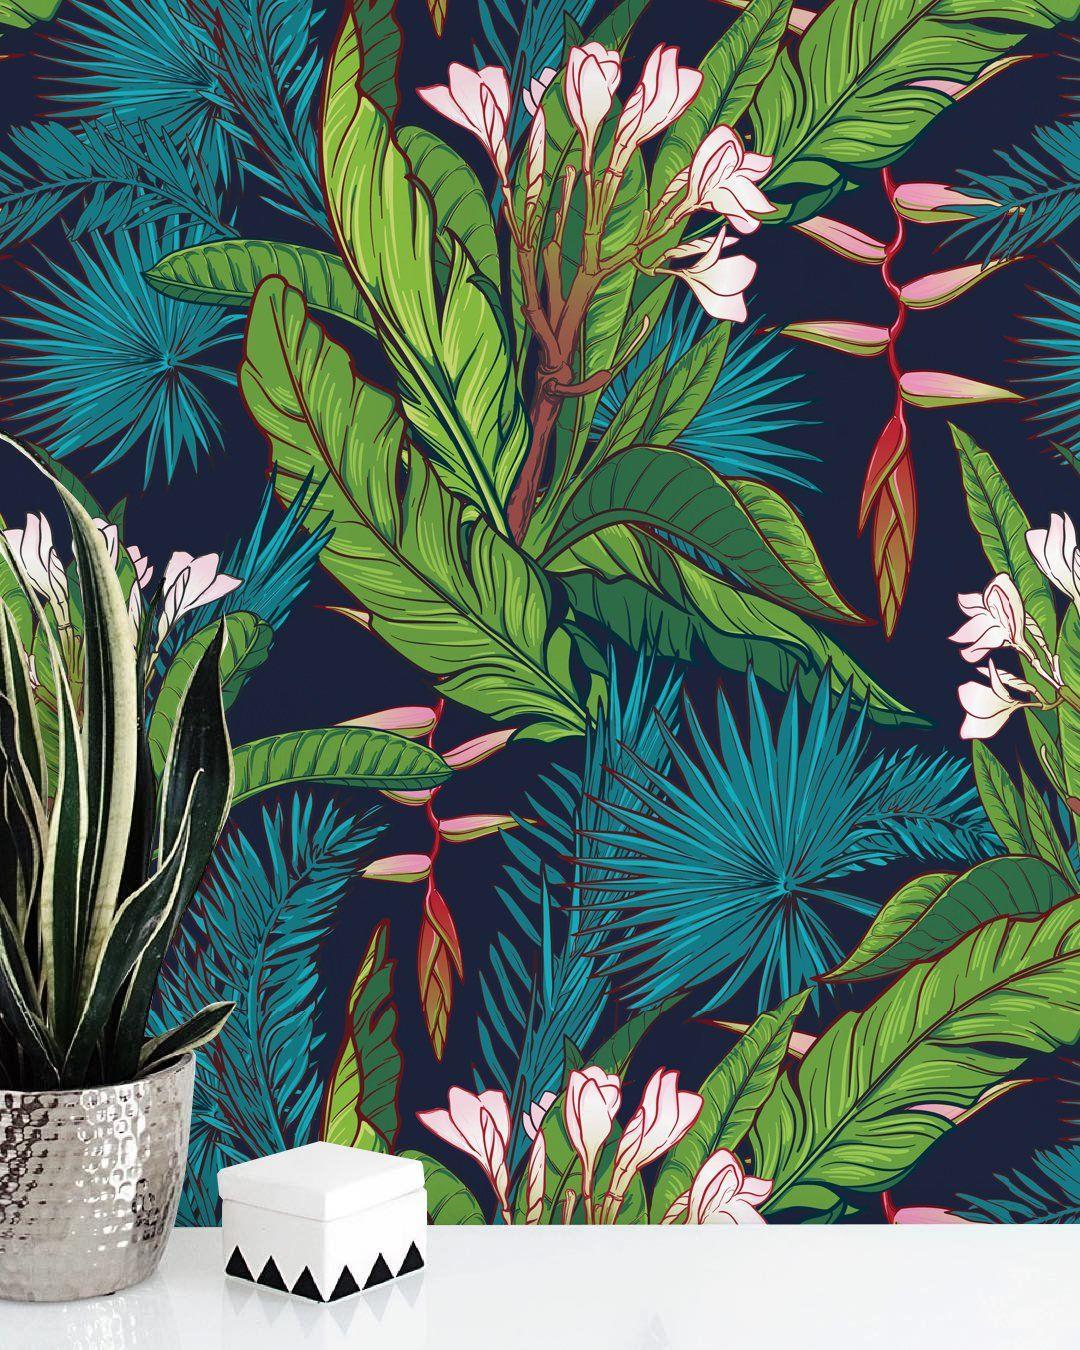 Tropical Jungle Removable Wallpaper Watercolor Wall Etsy Jungle Wallpaper Watercolor Walls Tropical Decor